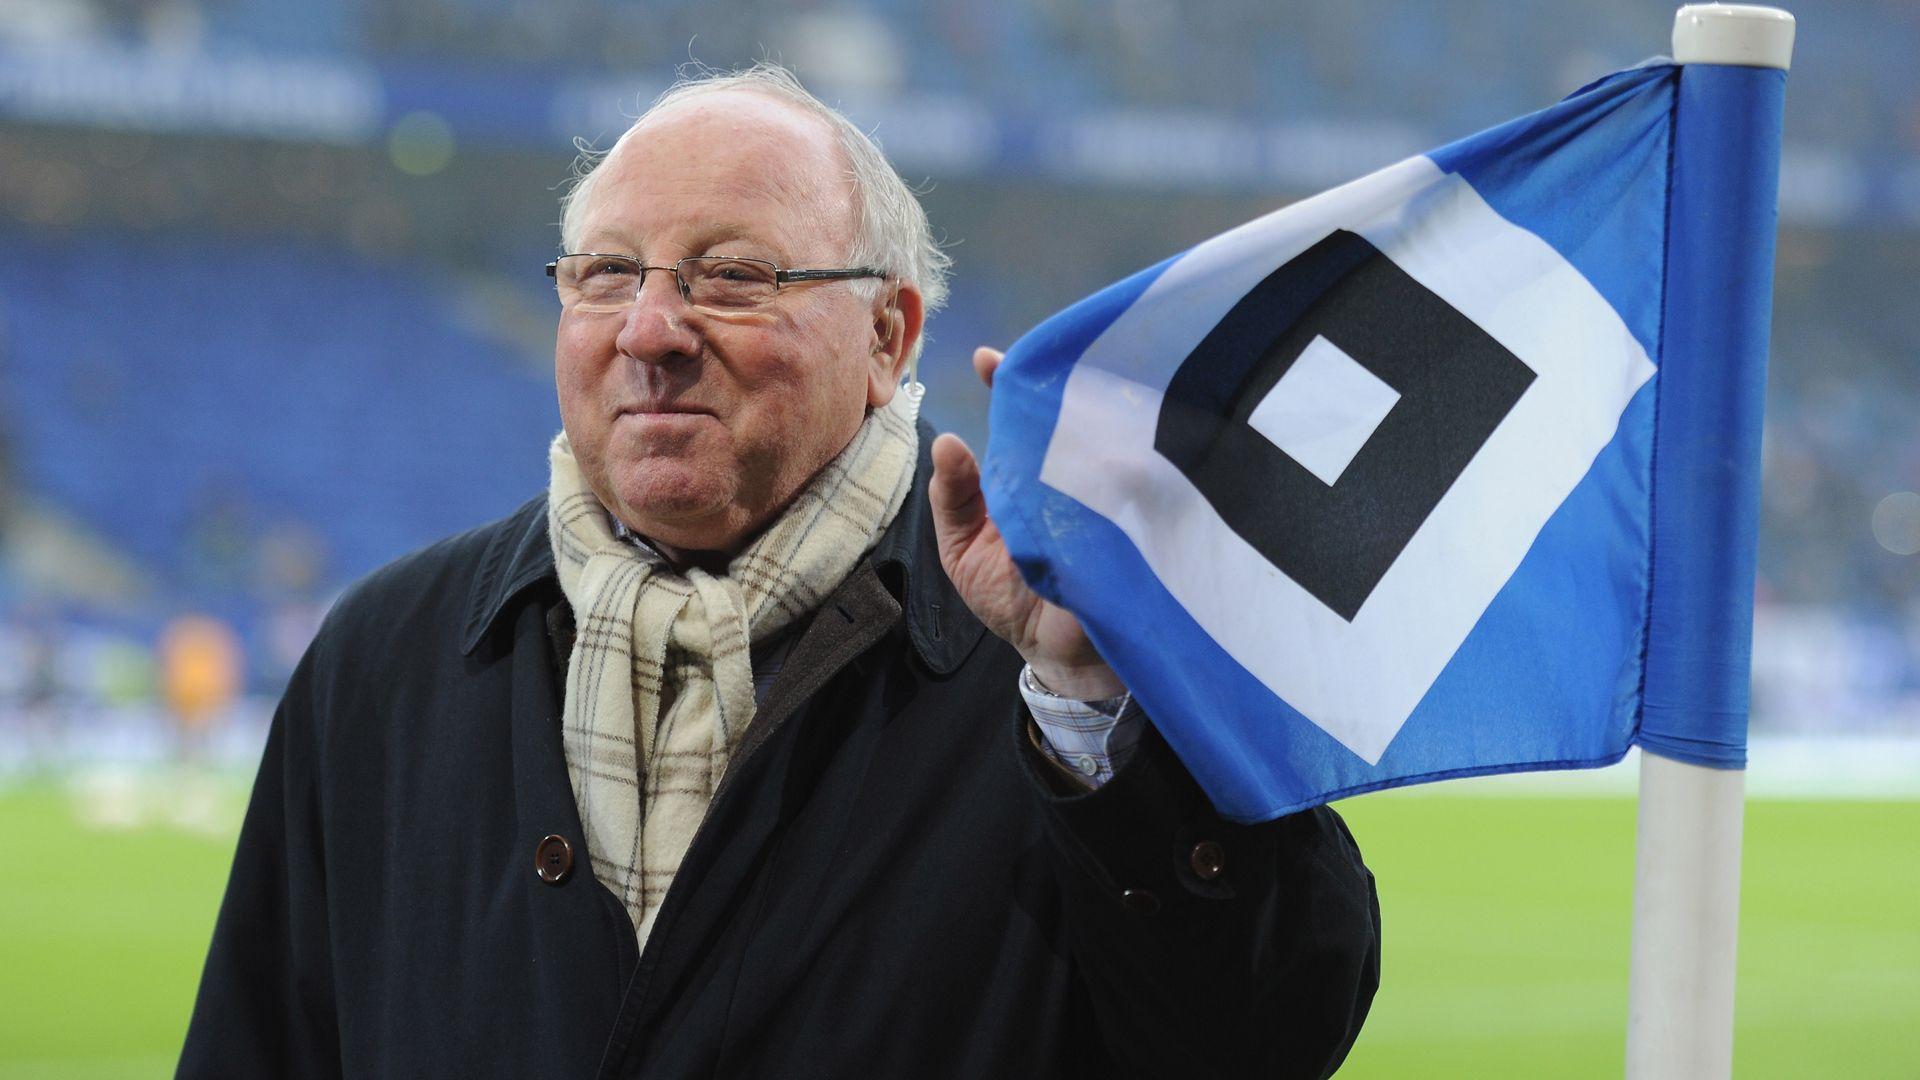 Bundesliga Hsv Legende Uwe Seeler Feiert 80 Geburtstag Hamburger Sv